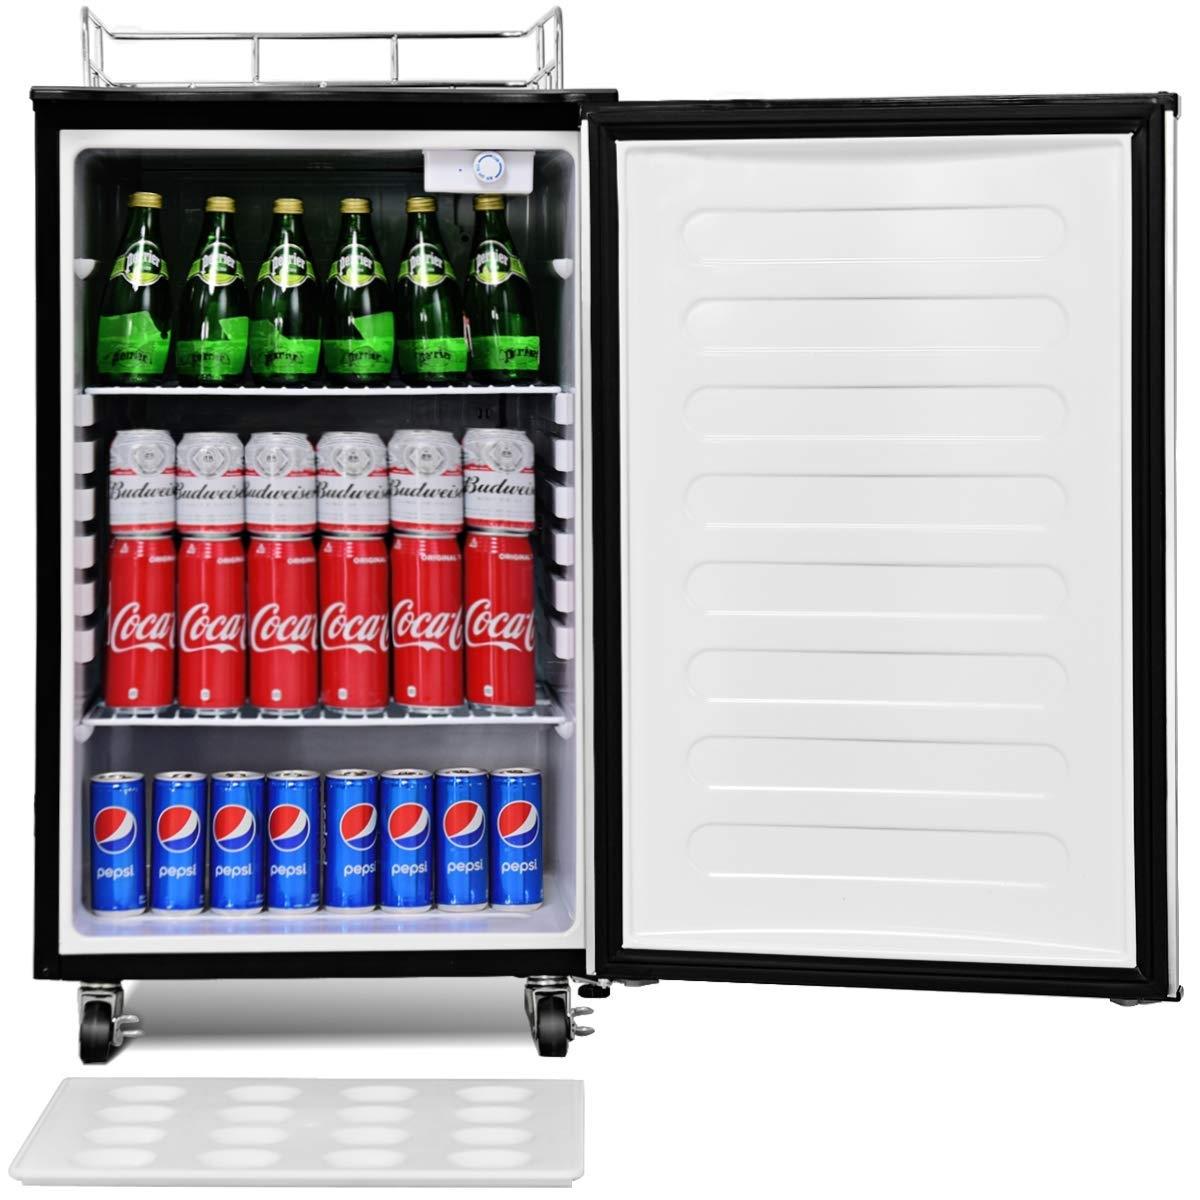 6.1 cu. ft Beer Dispenser Beer Cooler with Single-tap